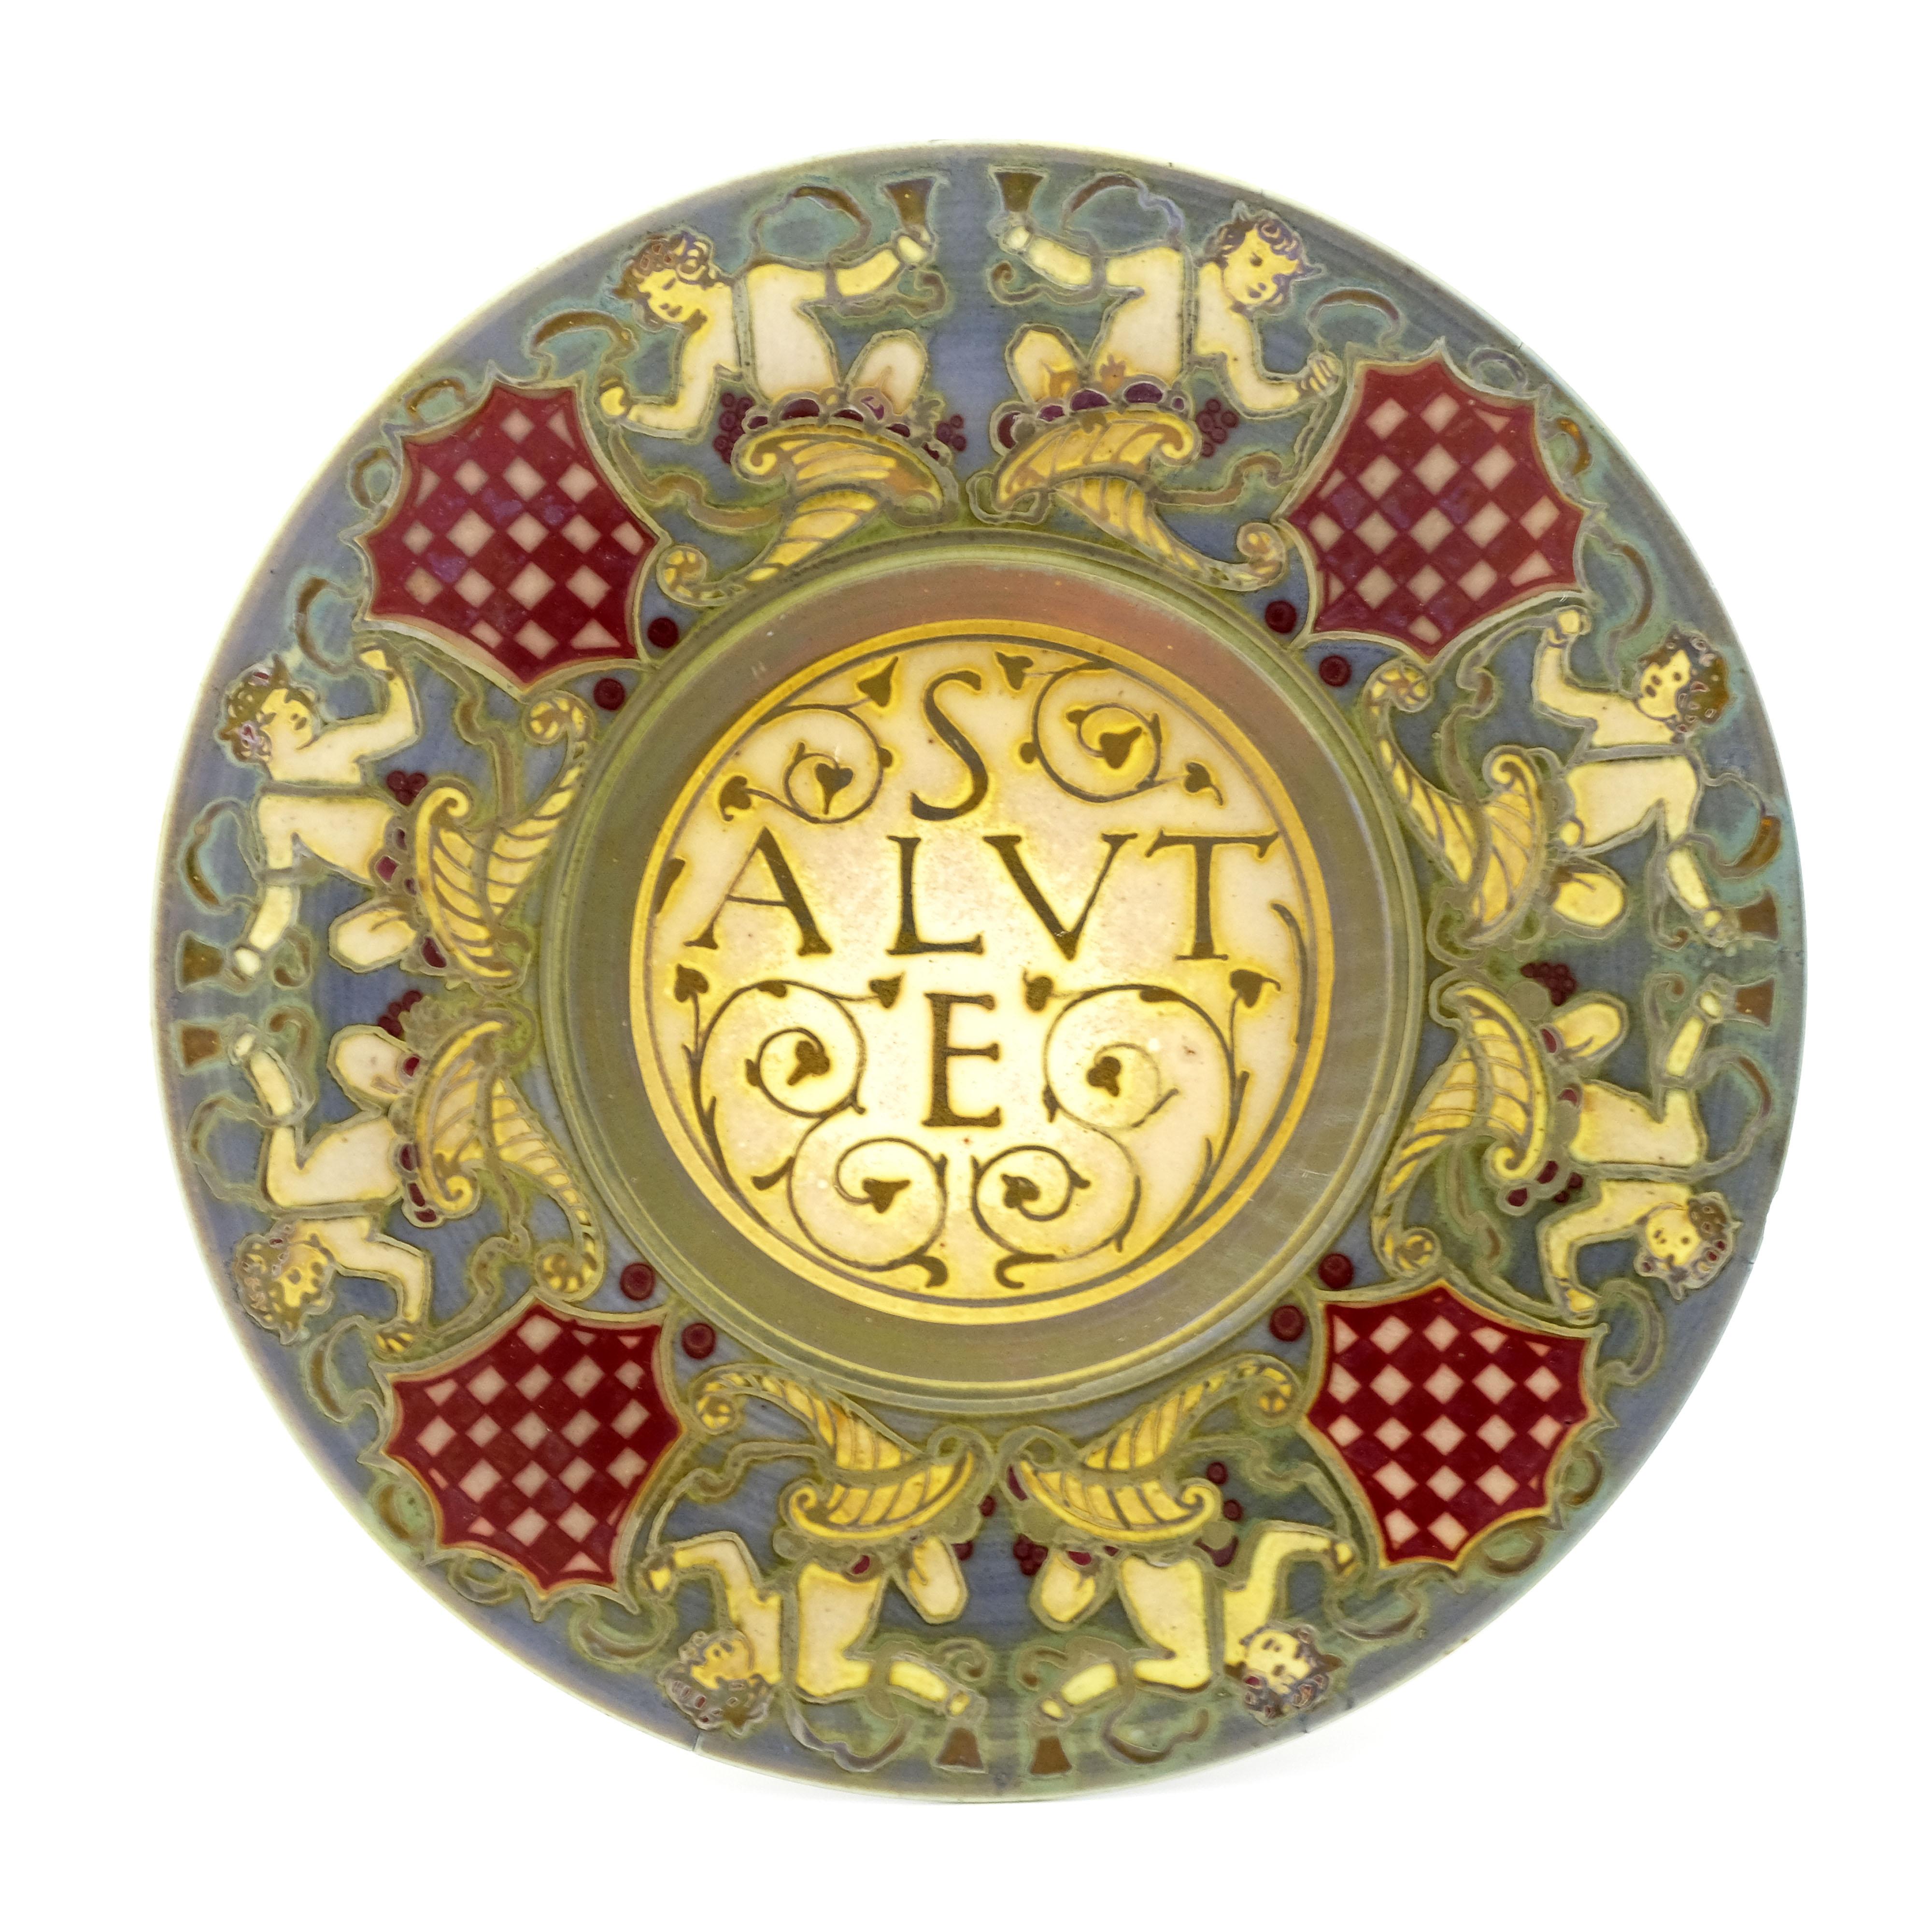 Gordon Forsyth for Pilkington, a Royal Lancastrian